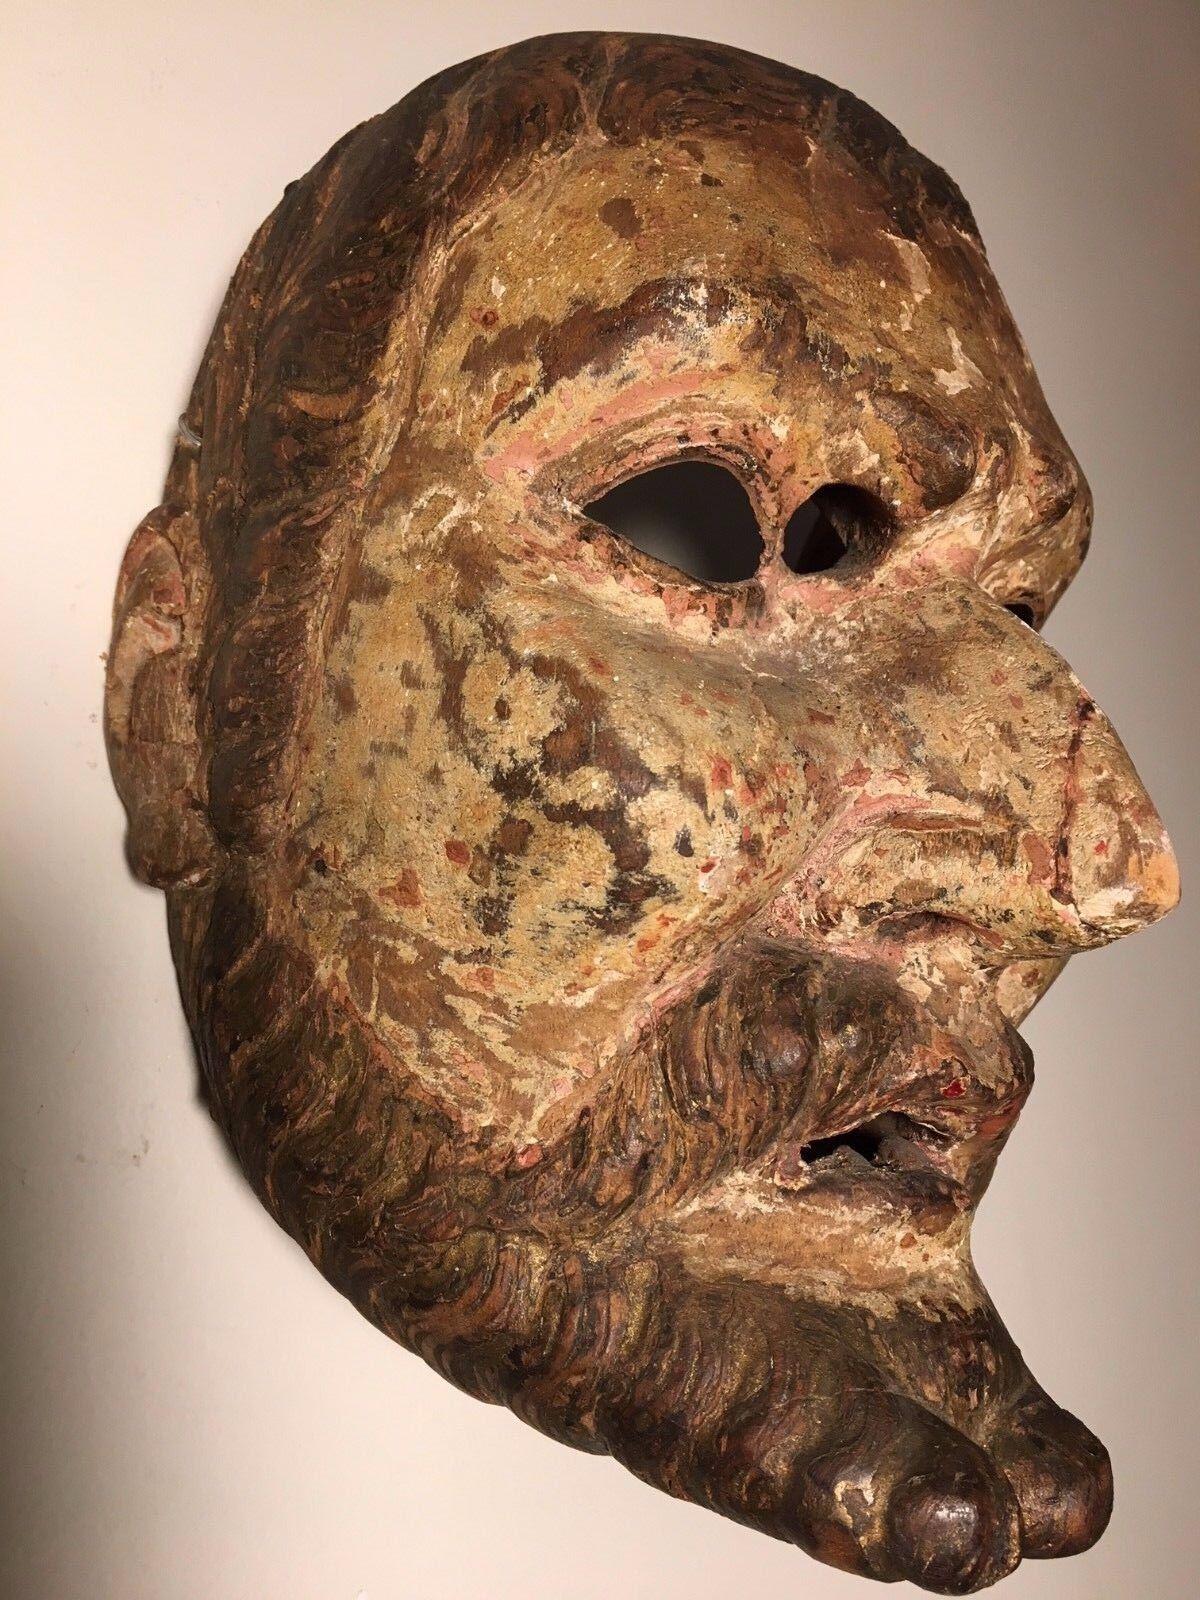 Antique, 19th Century, Ethnographic, Wooden/Wood Mask Guatemala (Guatemalan)